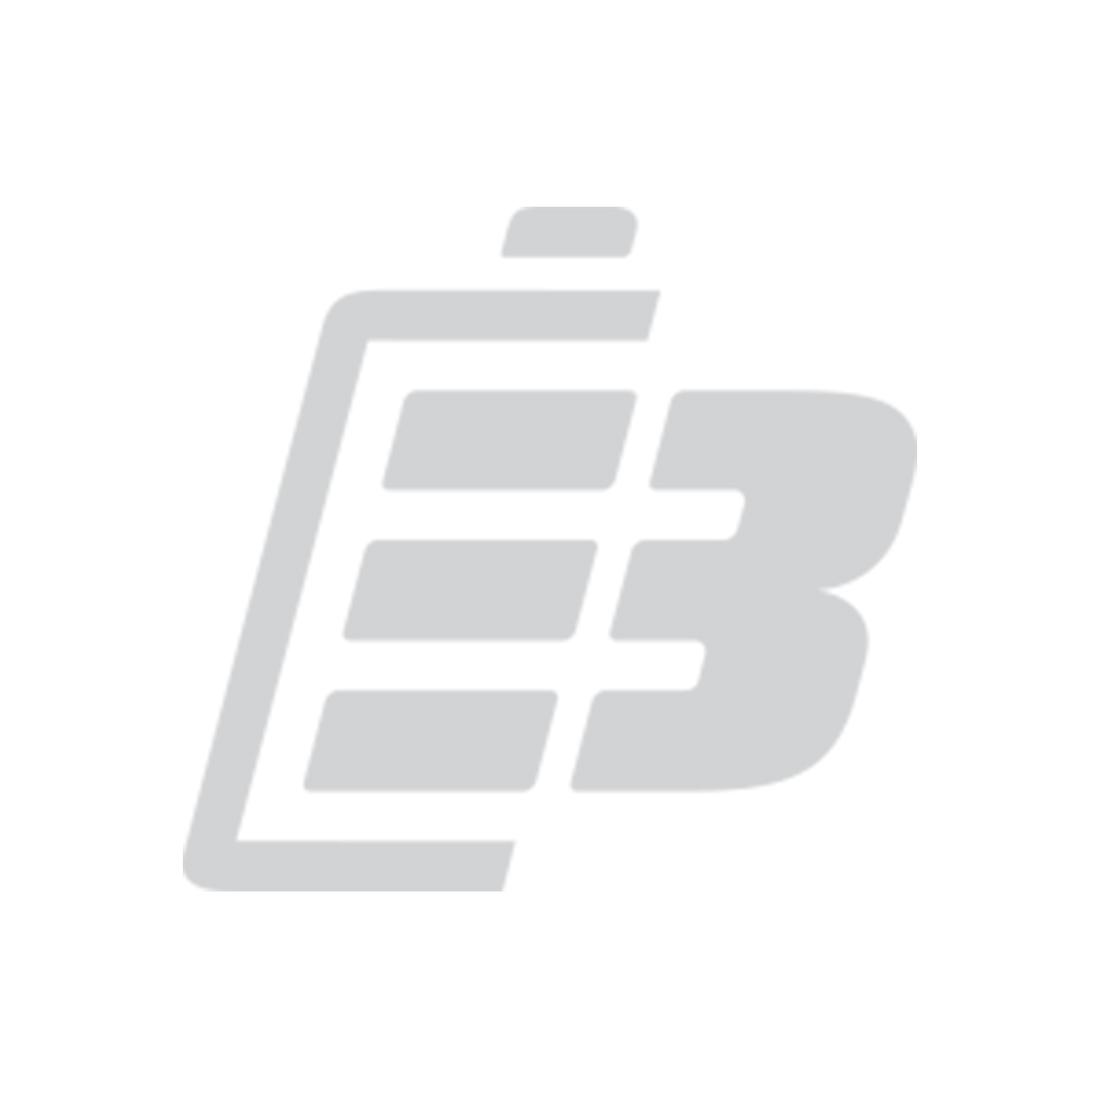 Barcode scanner battery Cipherlab CP55_1